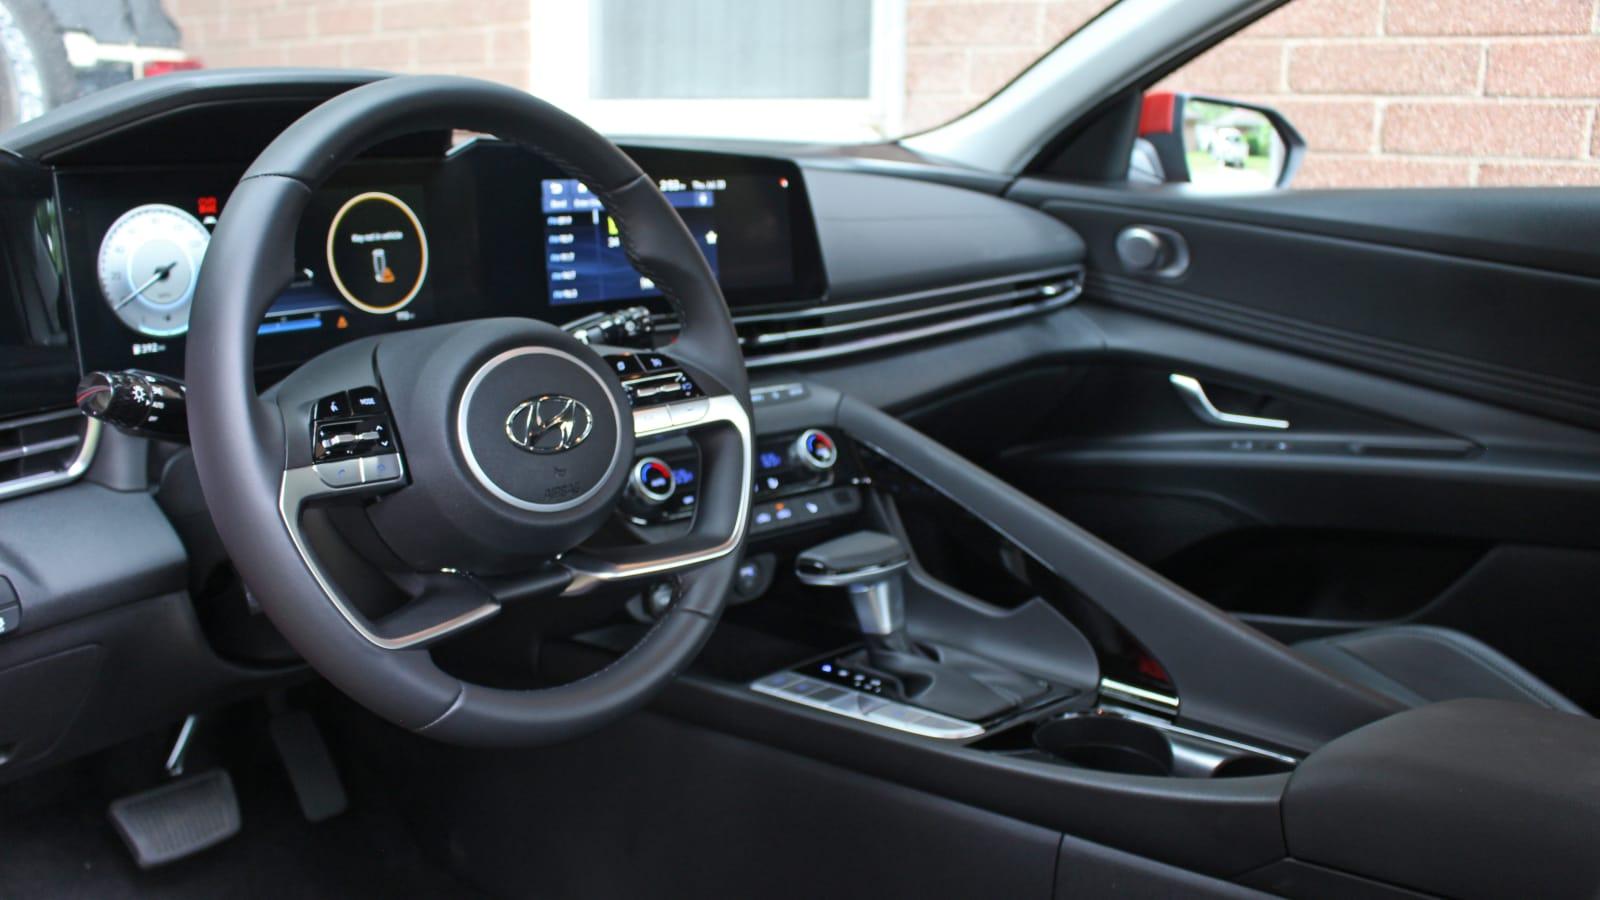 2021 Hyundai Elantra Review   Was ist neu, Preis, Sicherheit, Hybrid MPG